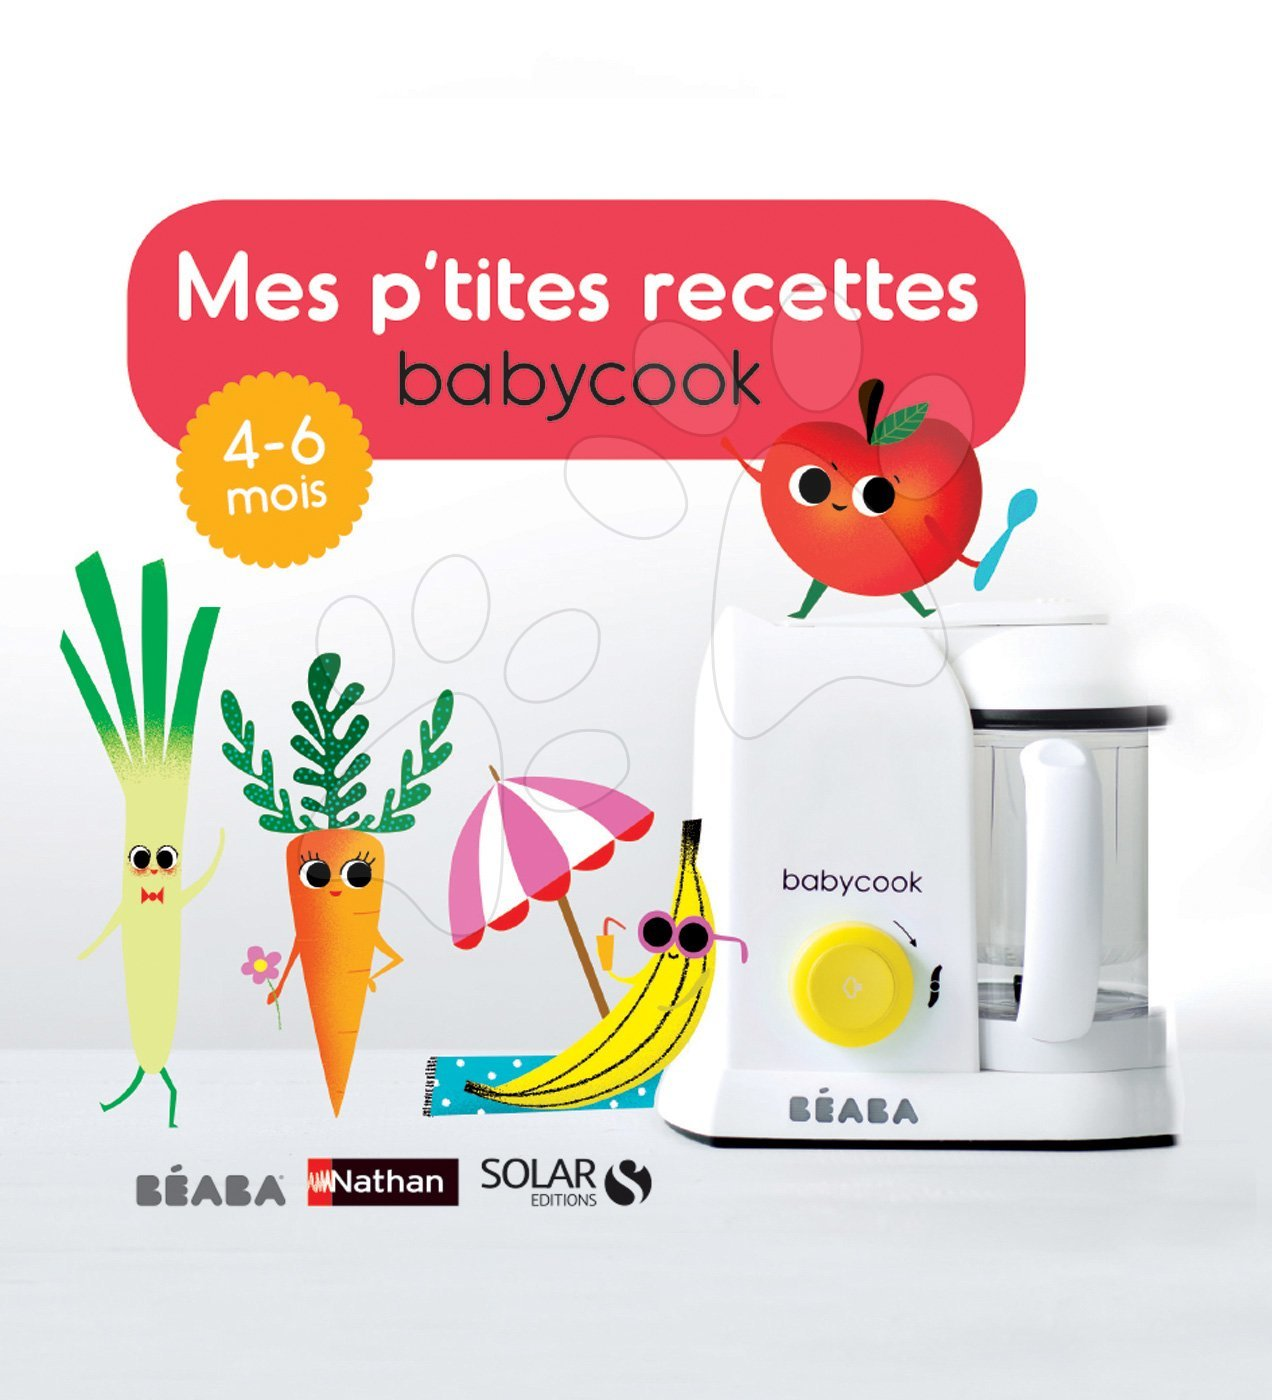 Kuchárska kniha Beaba ilustrovaná od 4-6 mesiacov francúzsky jazyk